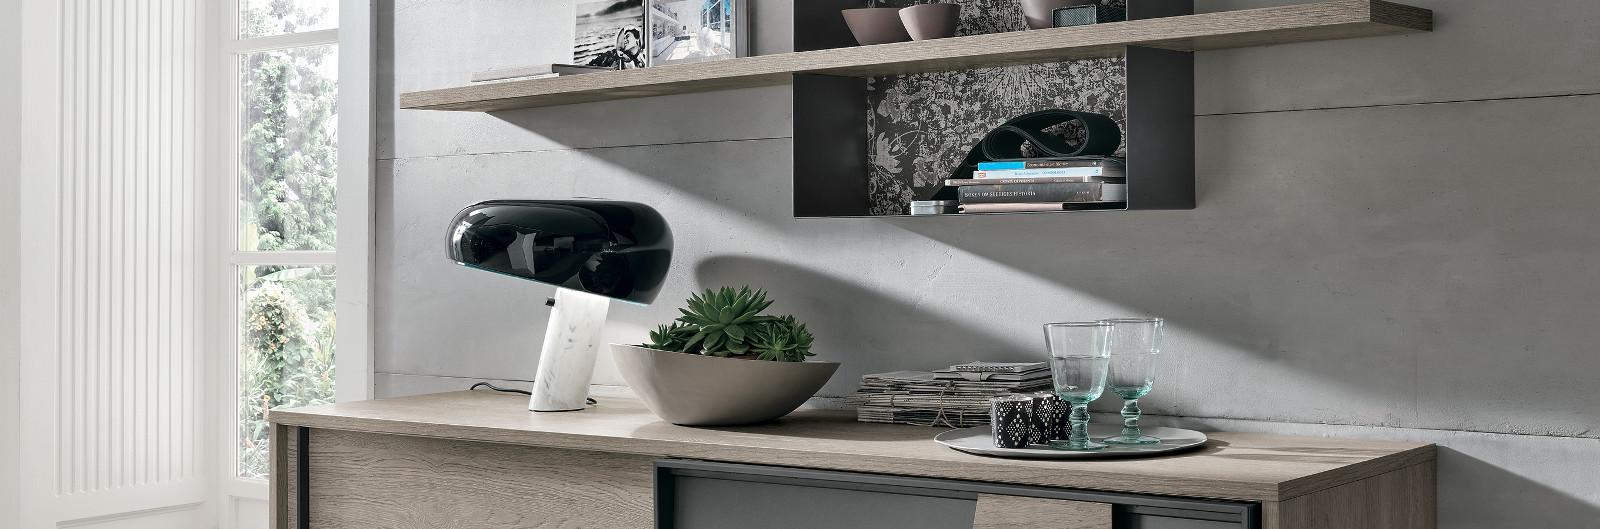 Mobili made in italy lucca progetto casa arredamenti - Progetto casa arredamenti ...